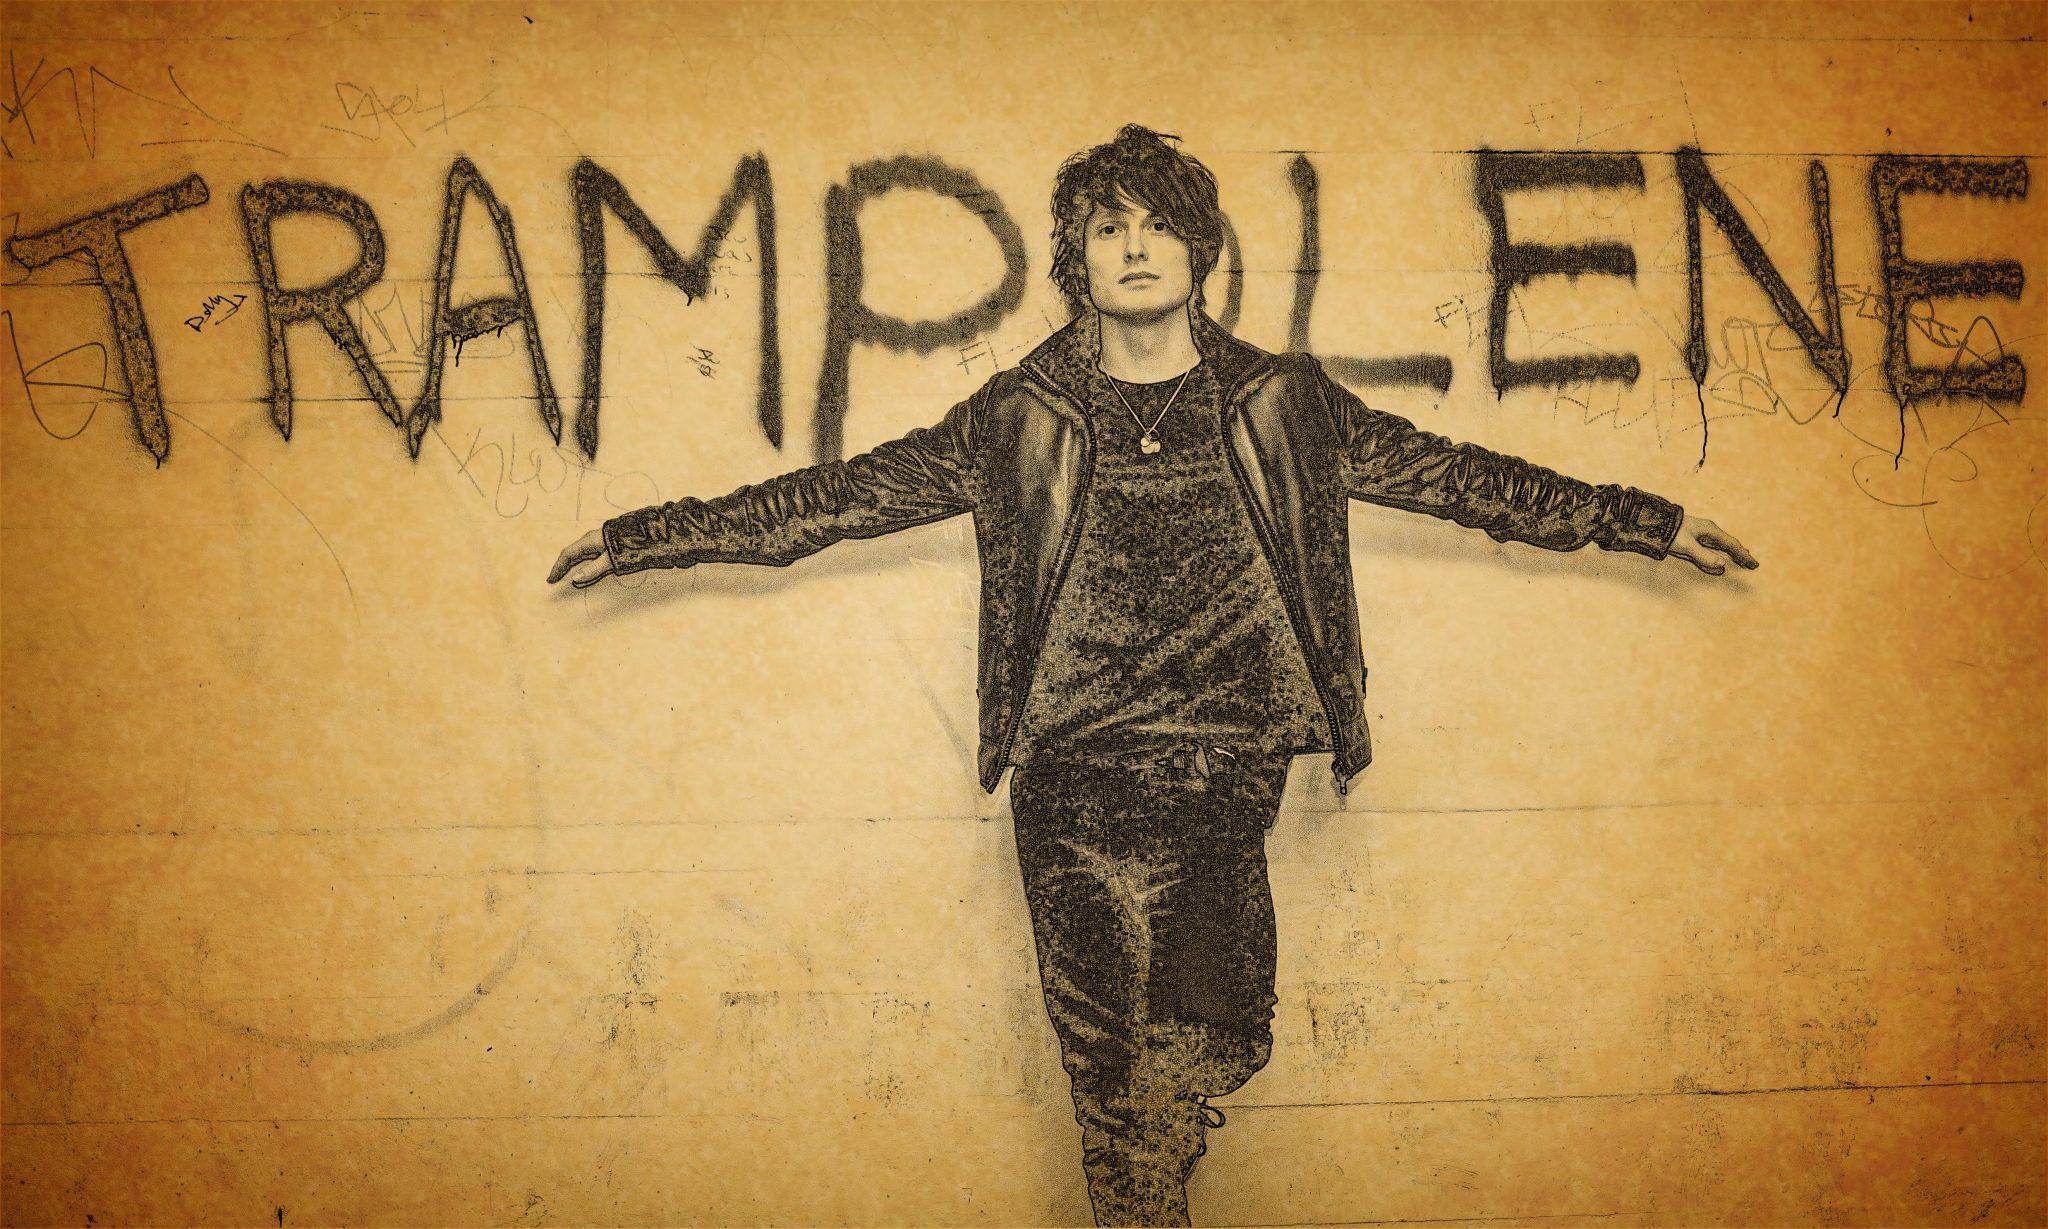 TRAMPOLENE - release single 'The Boy That Life Forgot' ahead of debut album